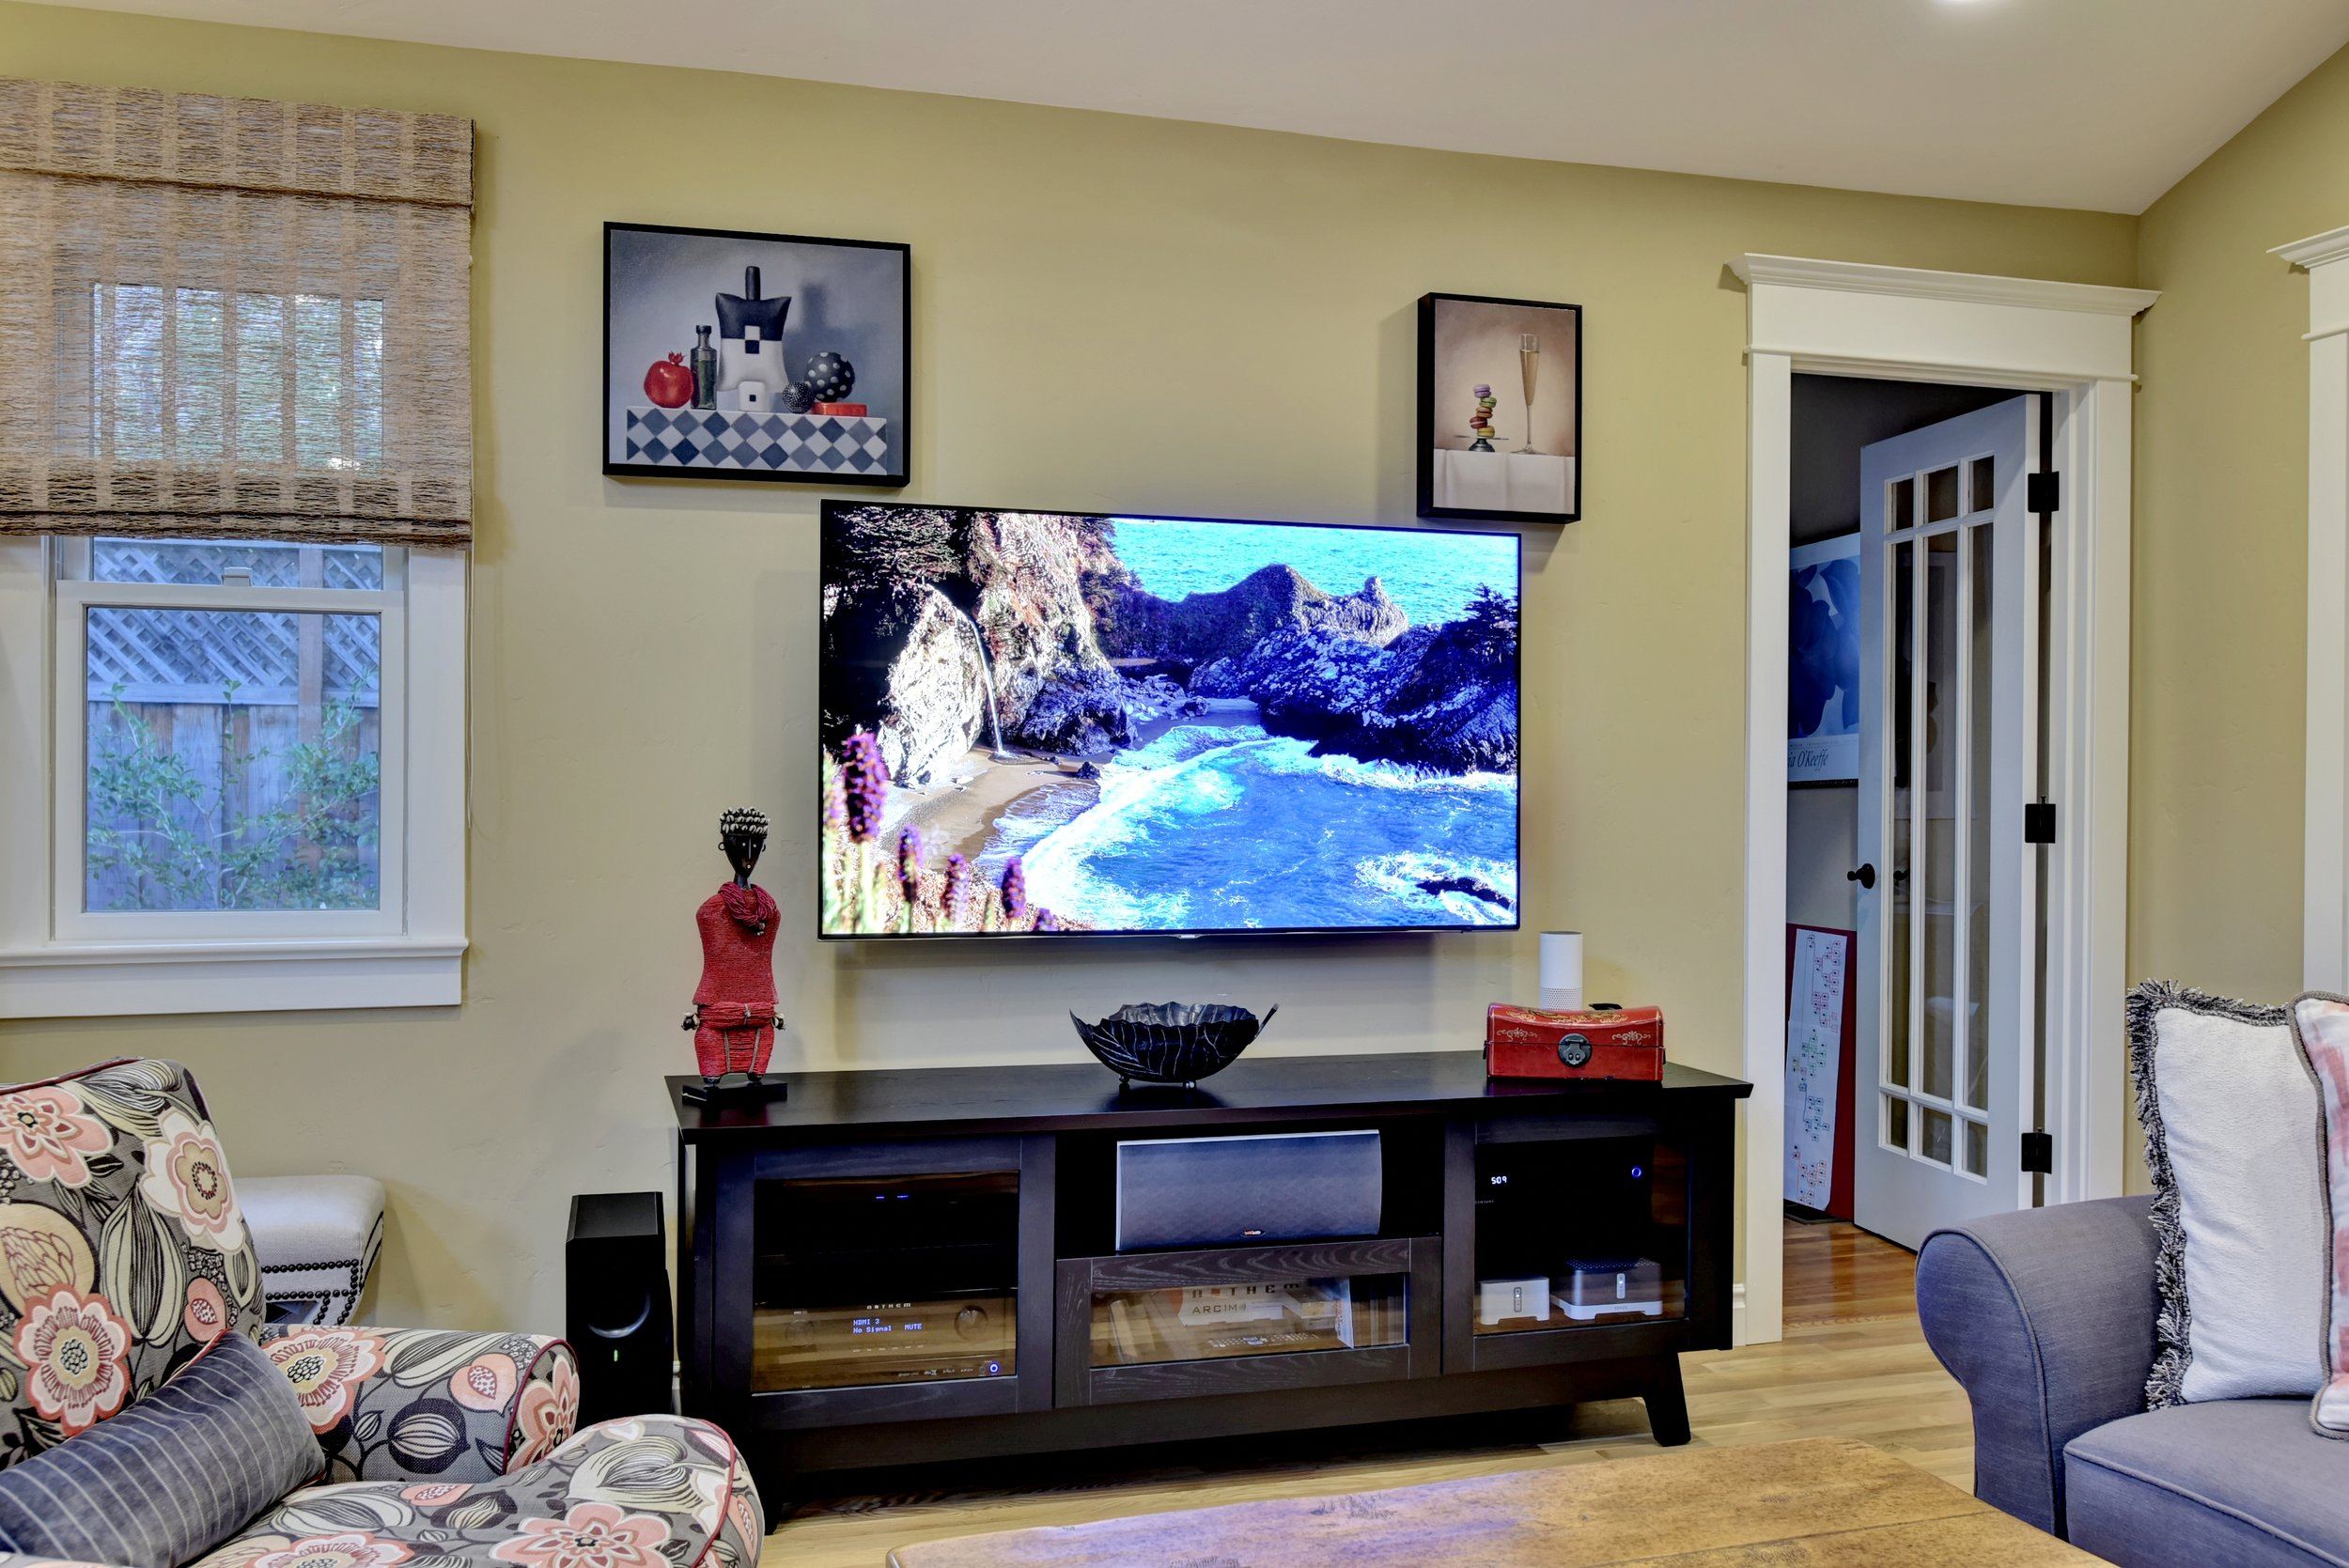 Samsung 65-inch 4k UHD LED TV with Anthem MRX-520 AV receiver housed in a Salamander AV cabinet media center